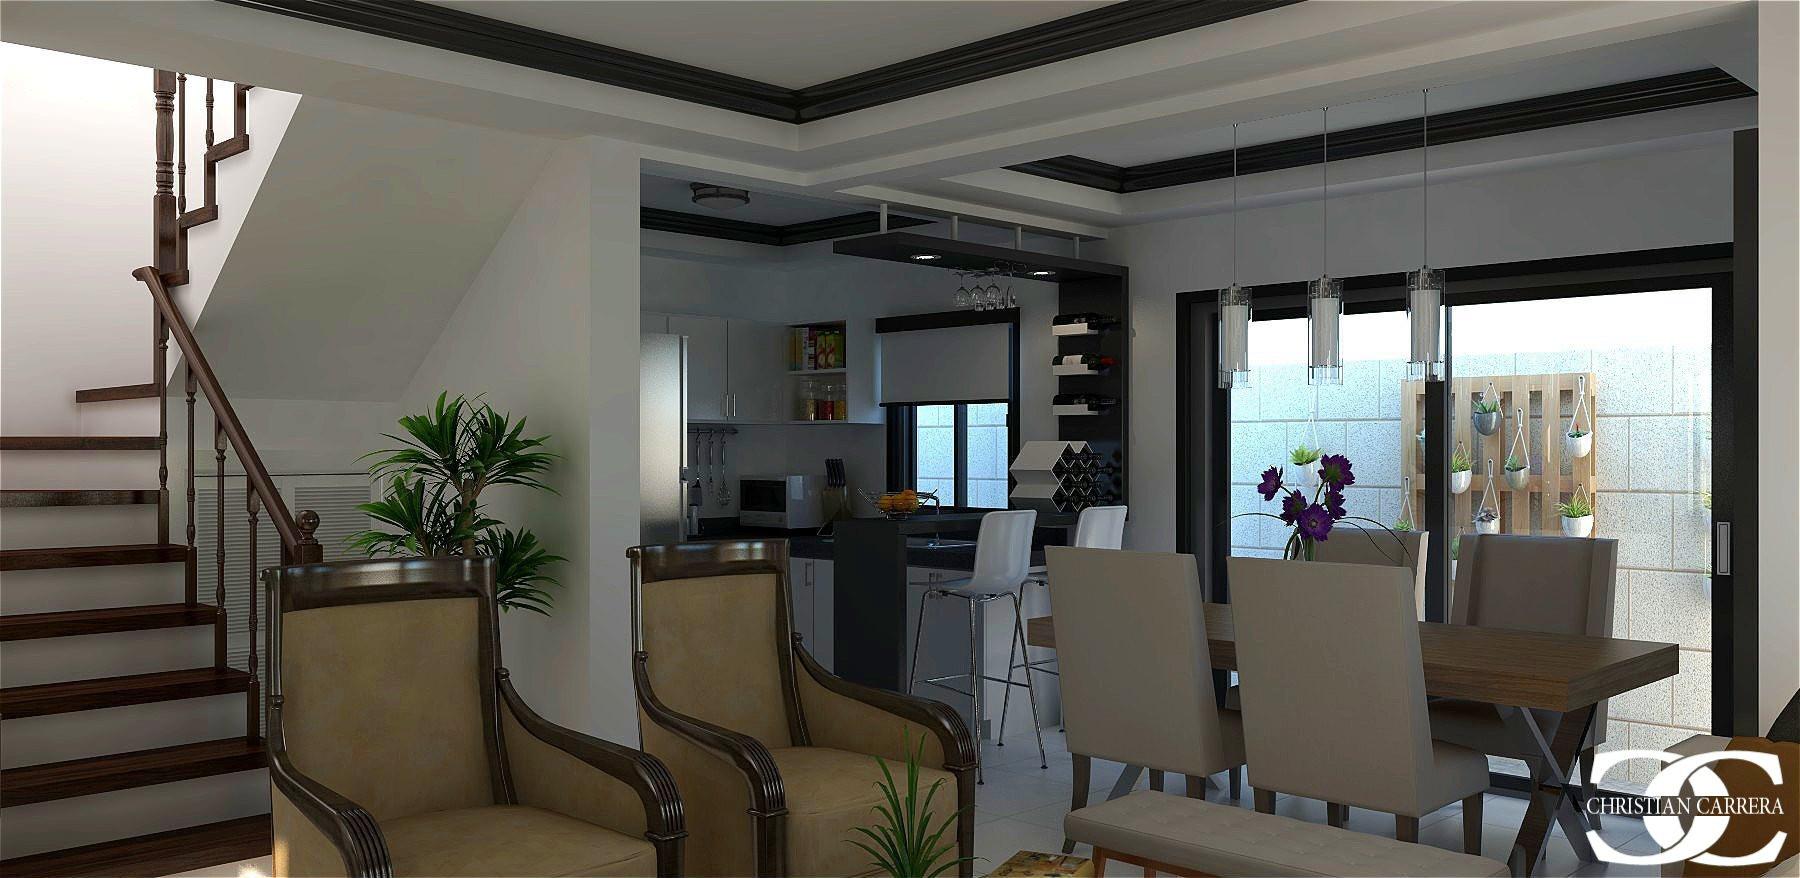 2019 sept 2 storey interior argona ground floor 03 mark.jpg